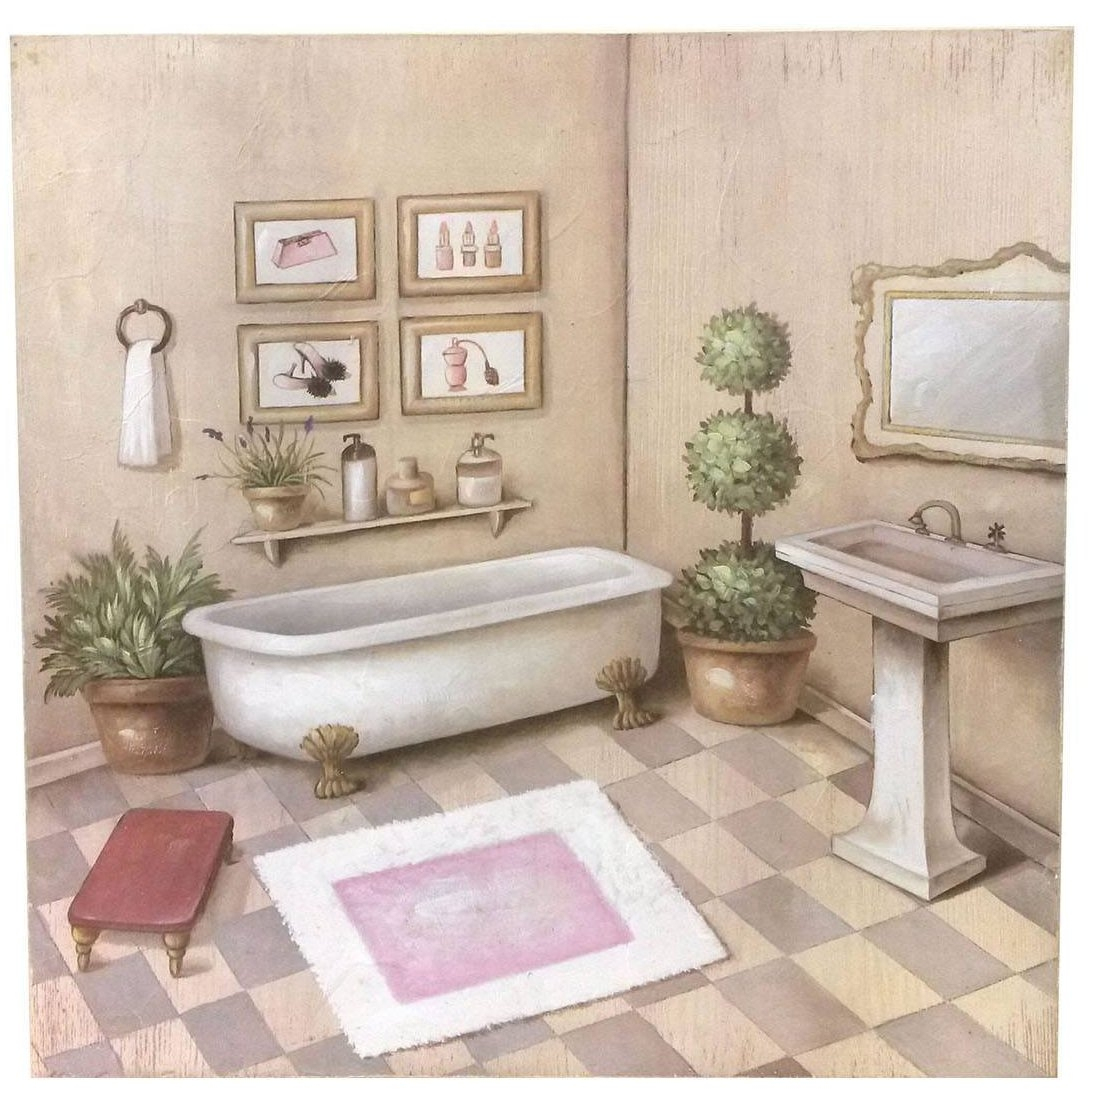 Quadro elise 39 bagno shabby quadri - Quadri da mettere in bagno ...